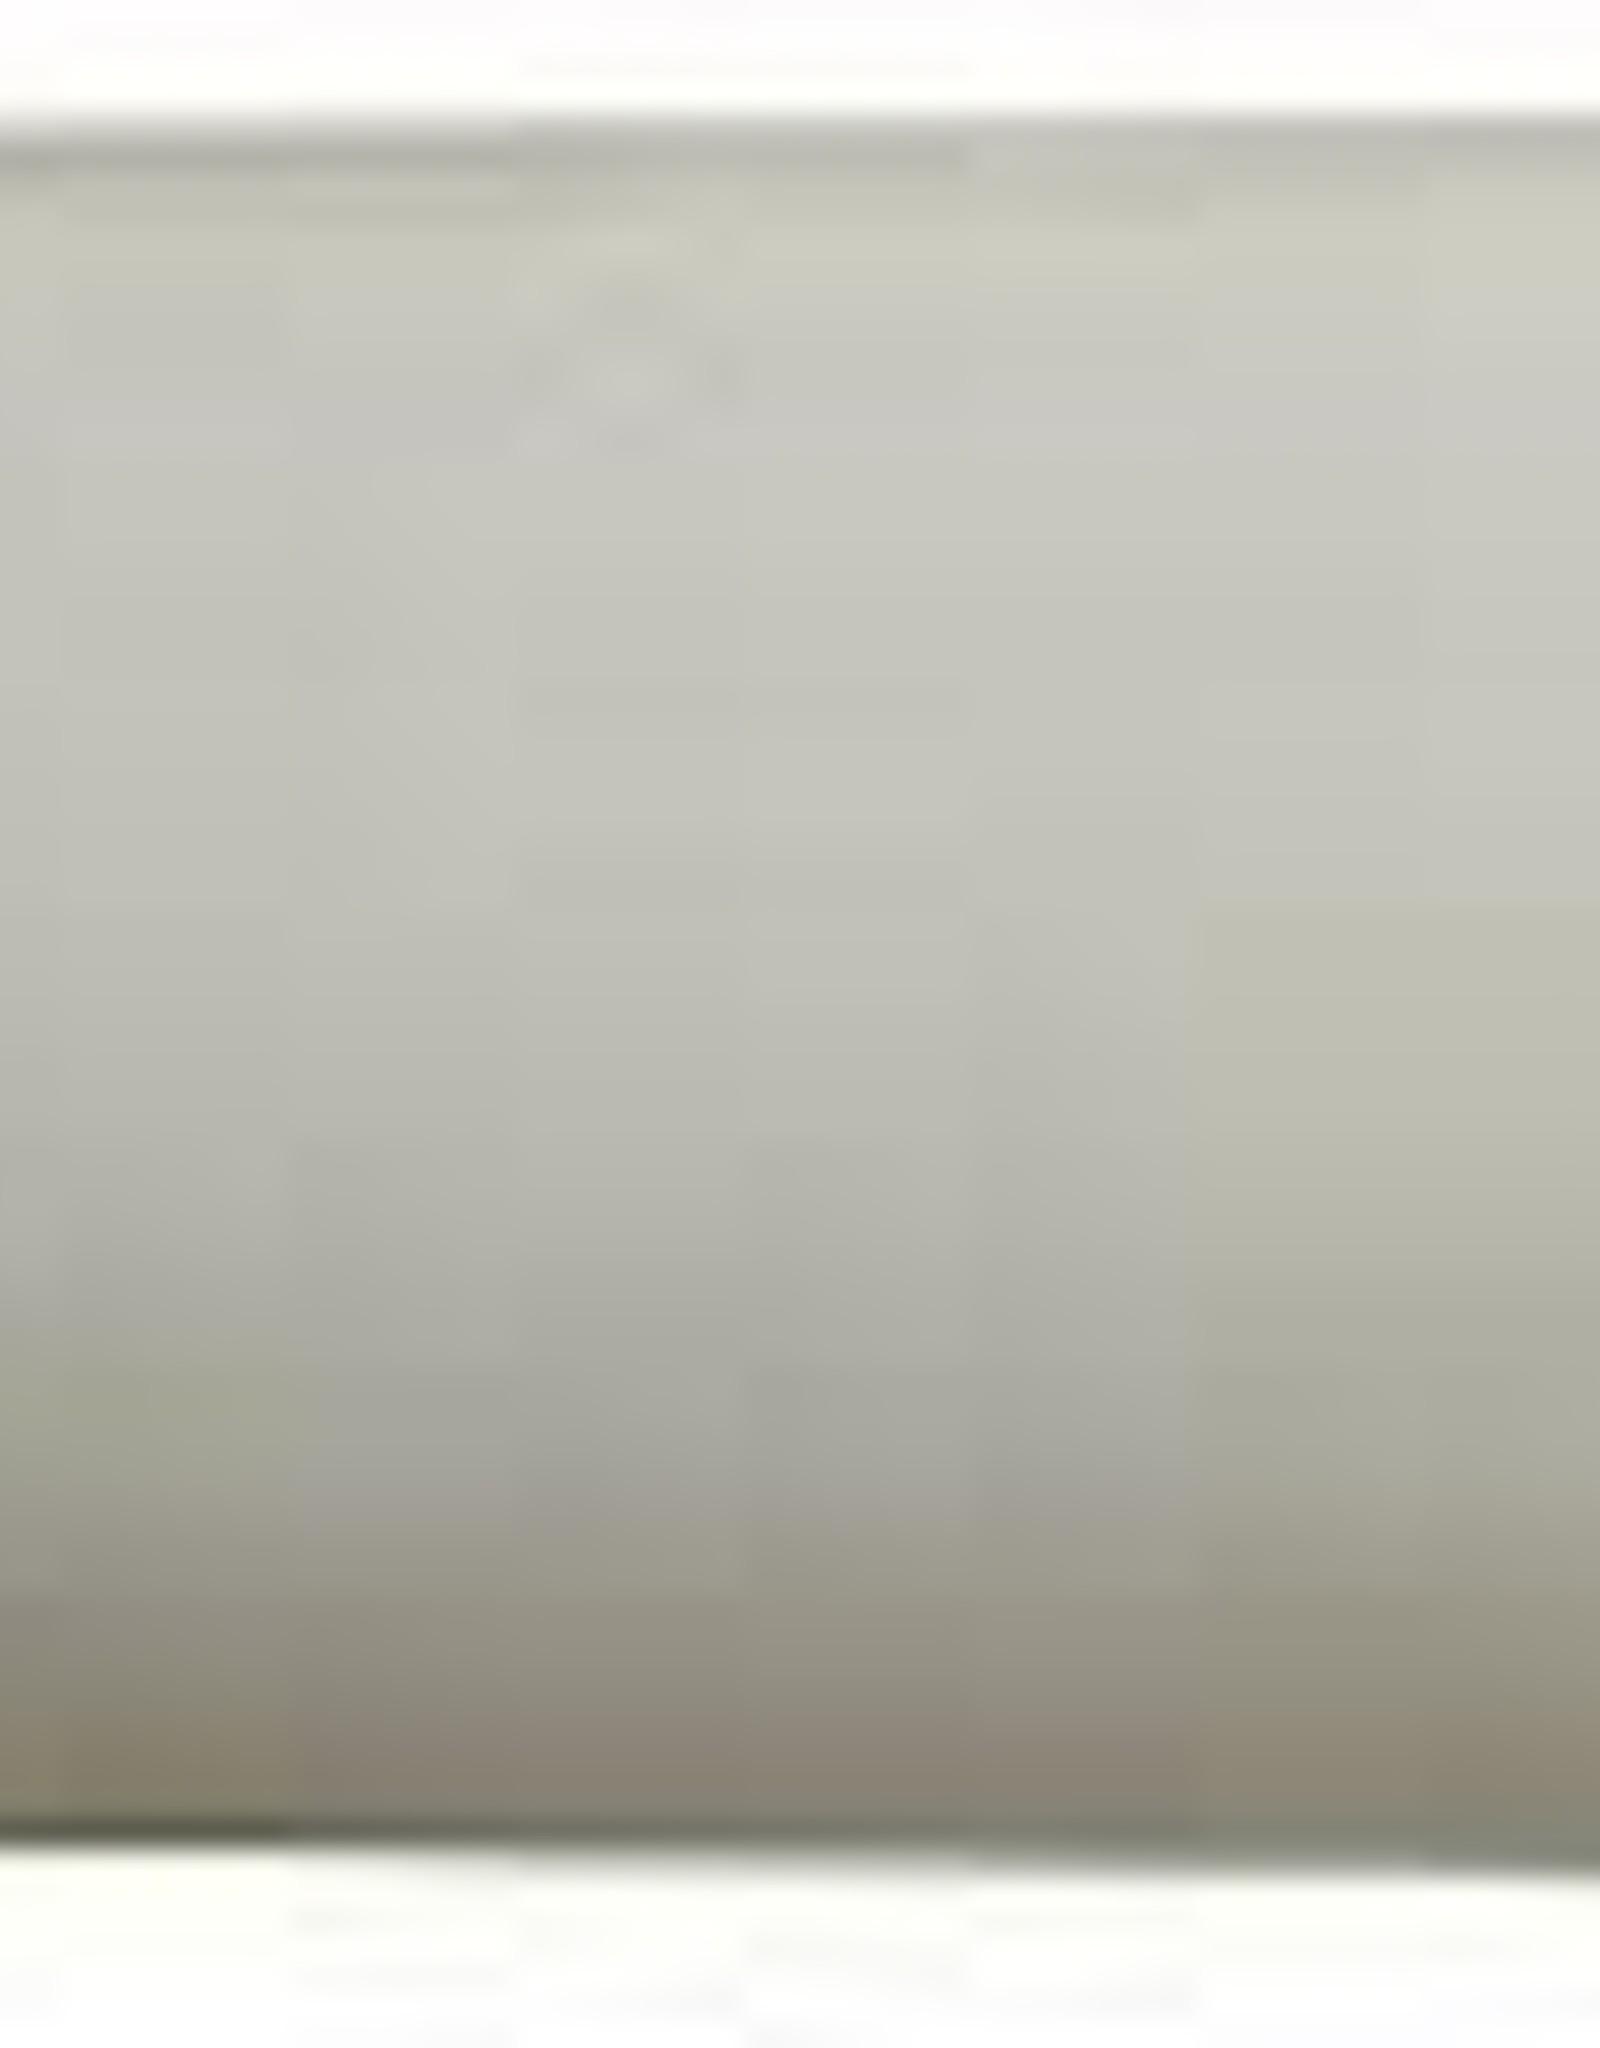 "1-1/2"" x 10' Length Sch40 PVC Pipe"